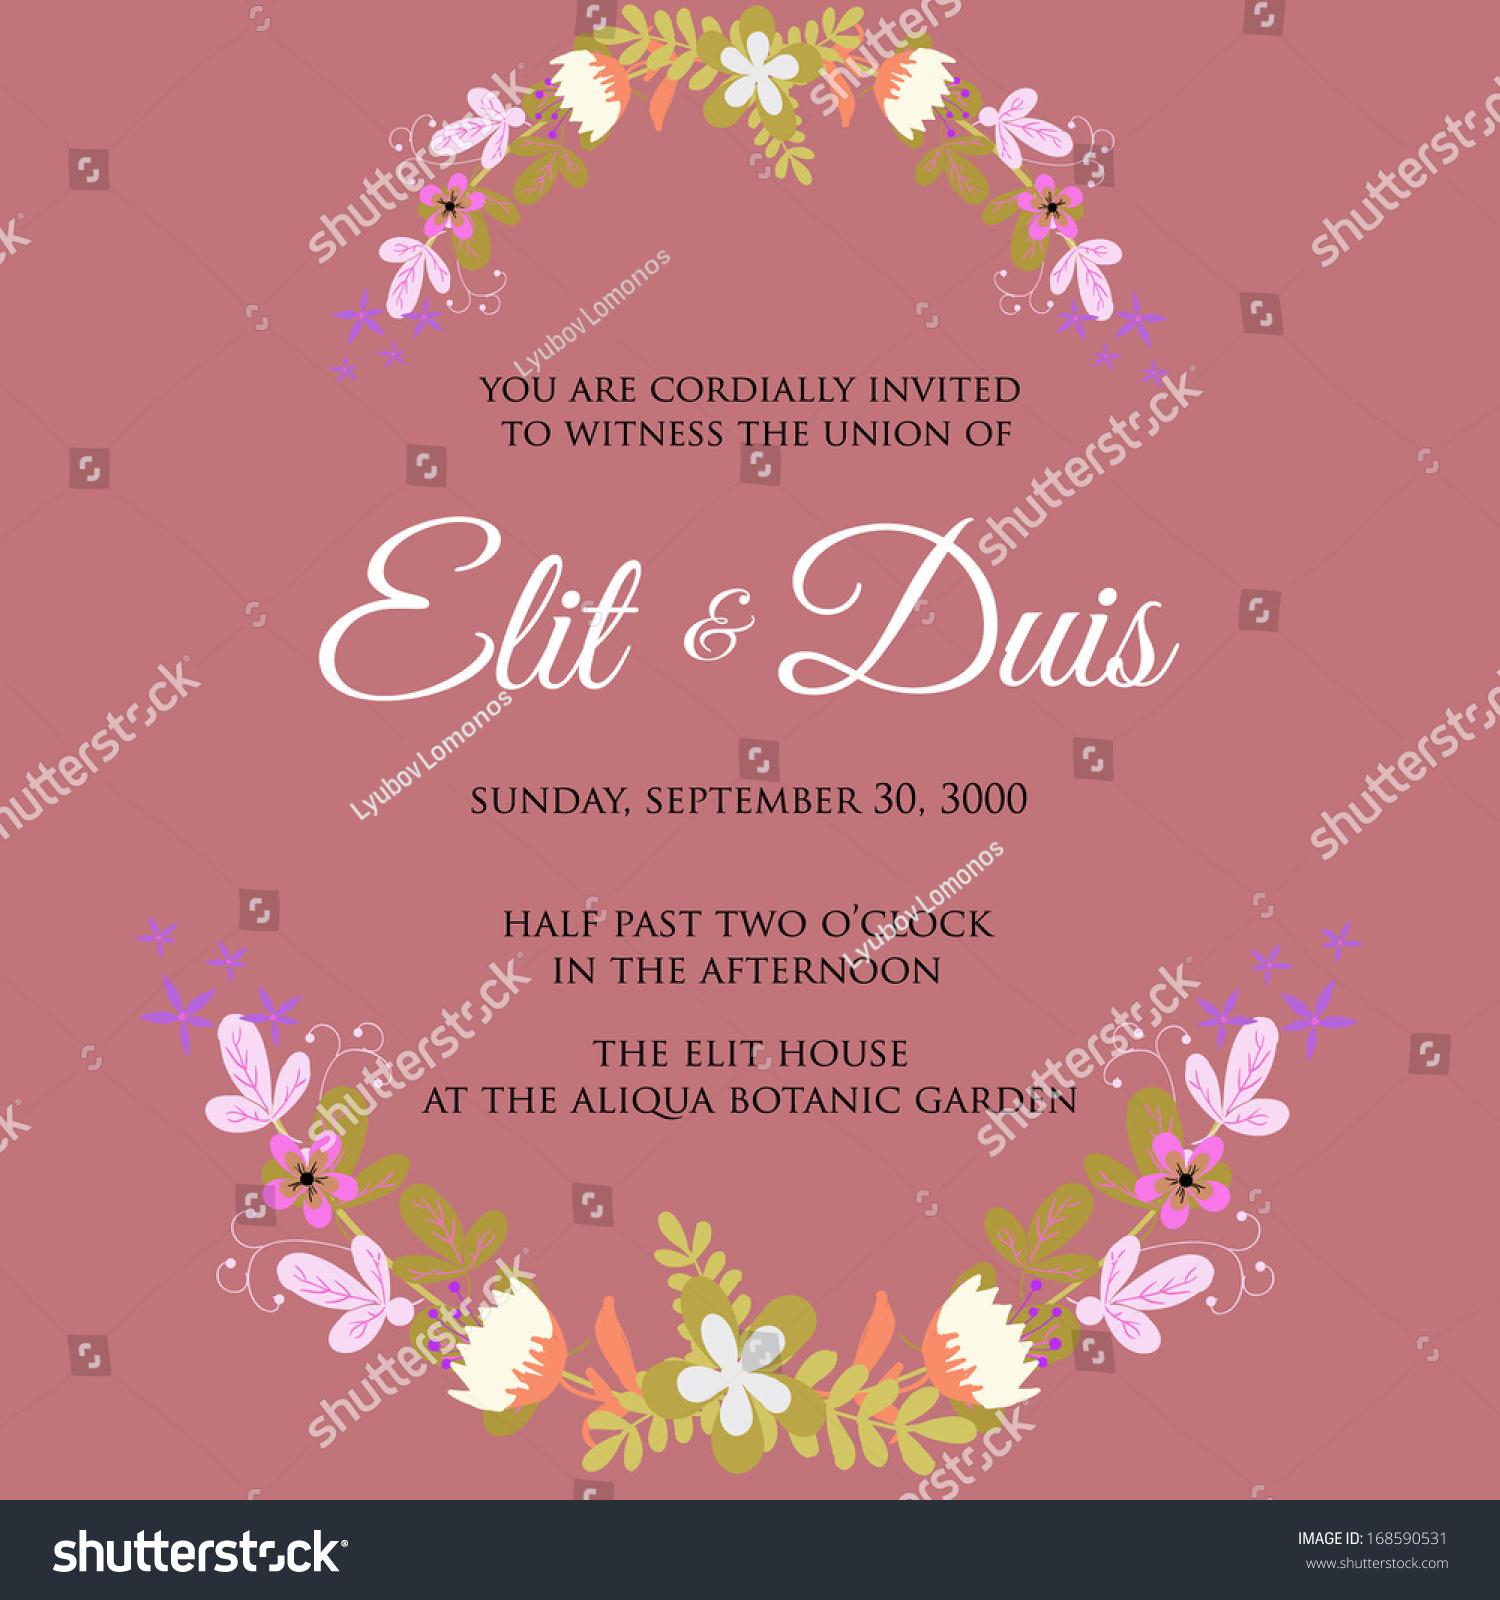 Magnificent Wedding Invitation You Are Cordially Invited Inspiration ...